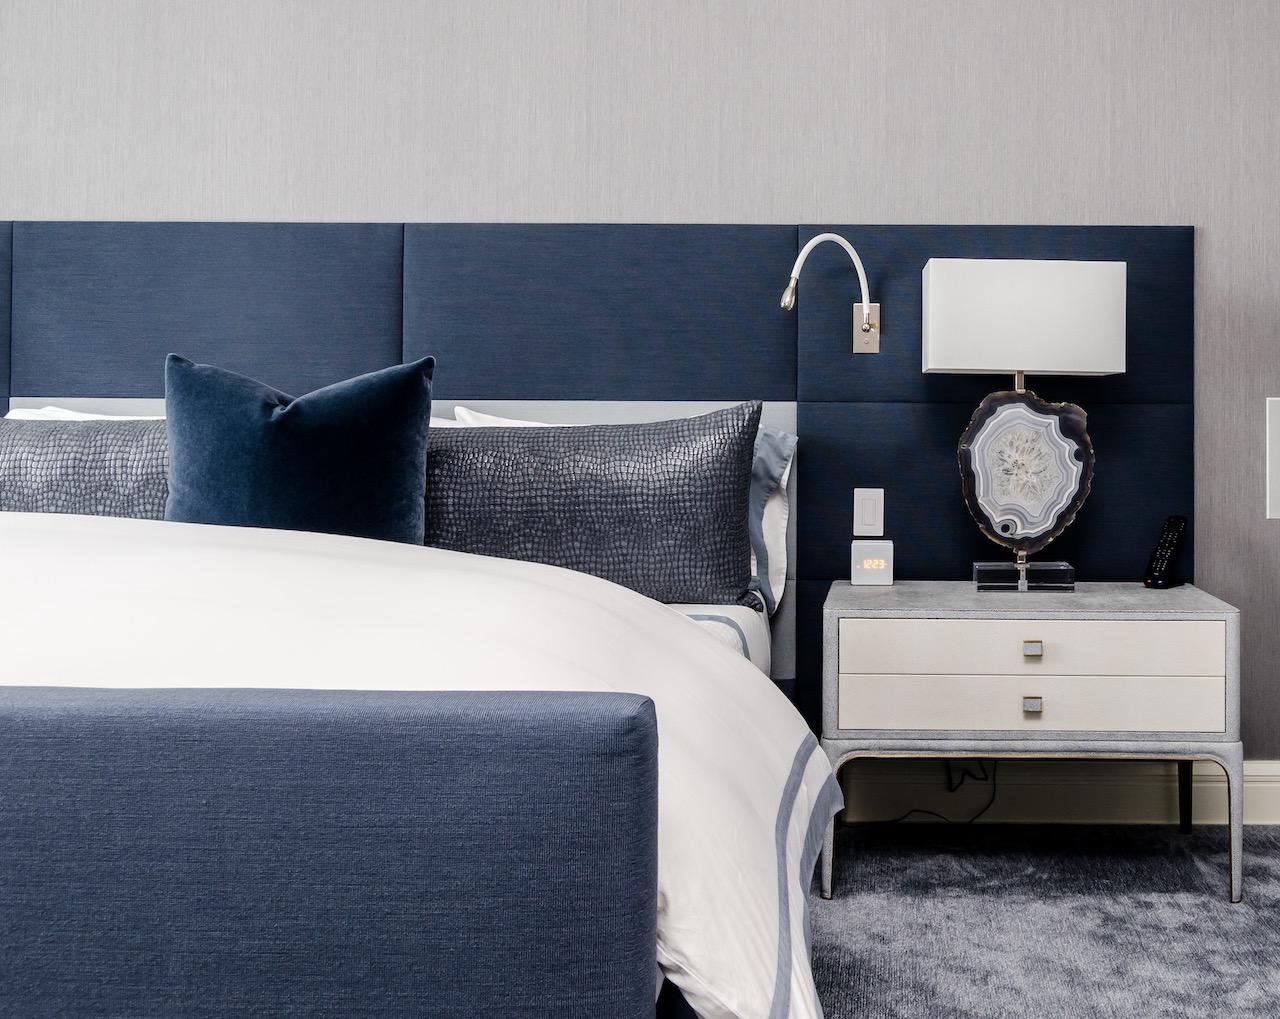 A tempur mattress in a bedroom